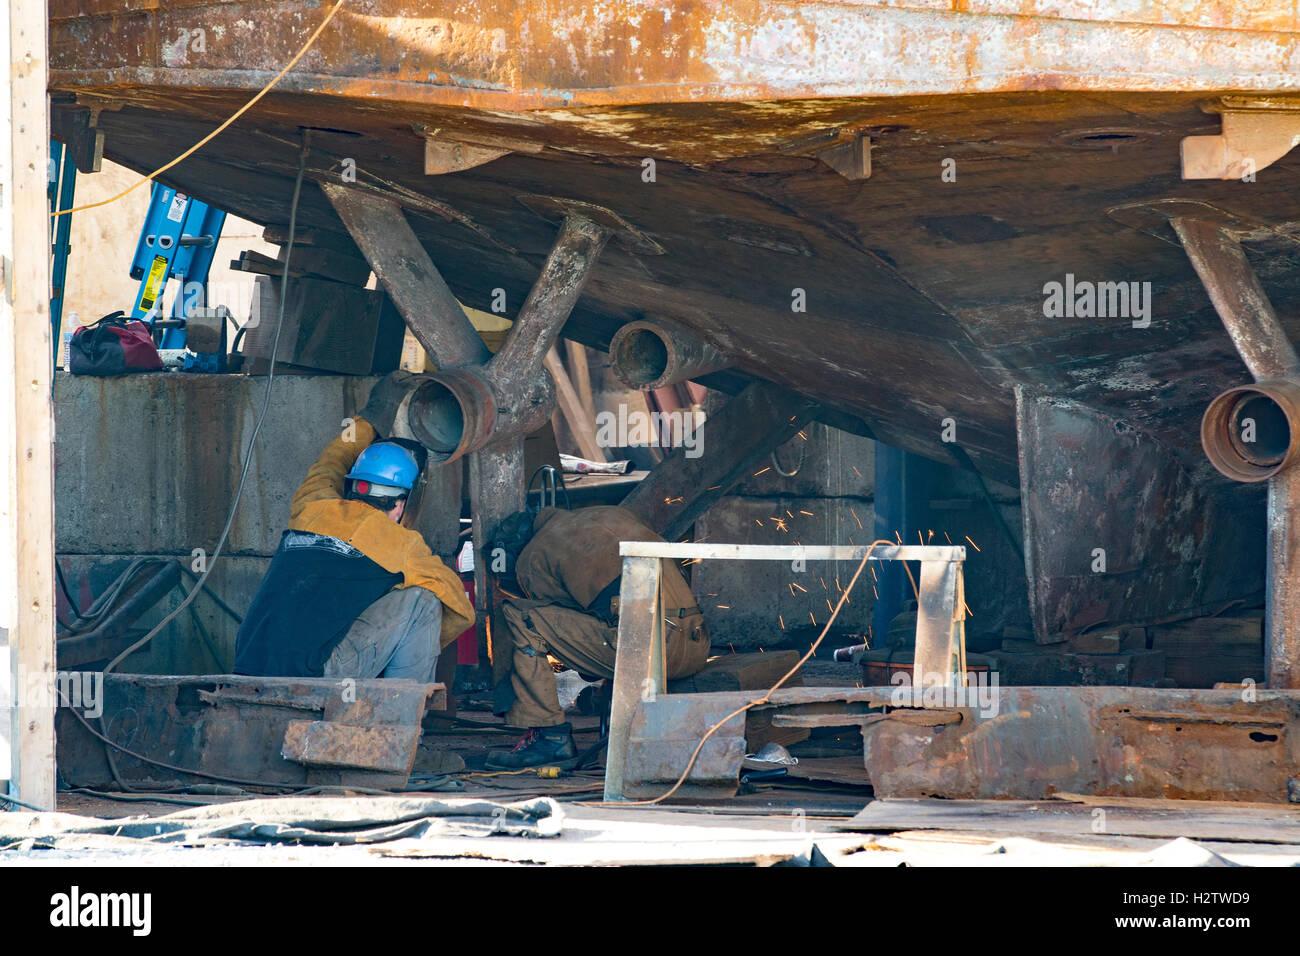 Barco de acero, reparación de buques en dique seco por shipwright en Port Townsend astillero. Imagen De Stock